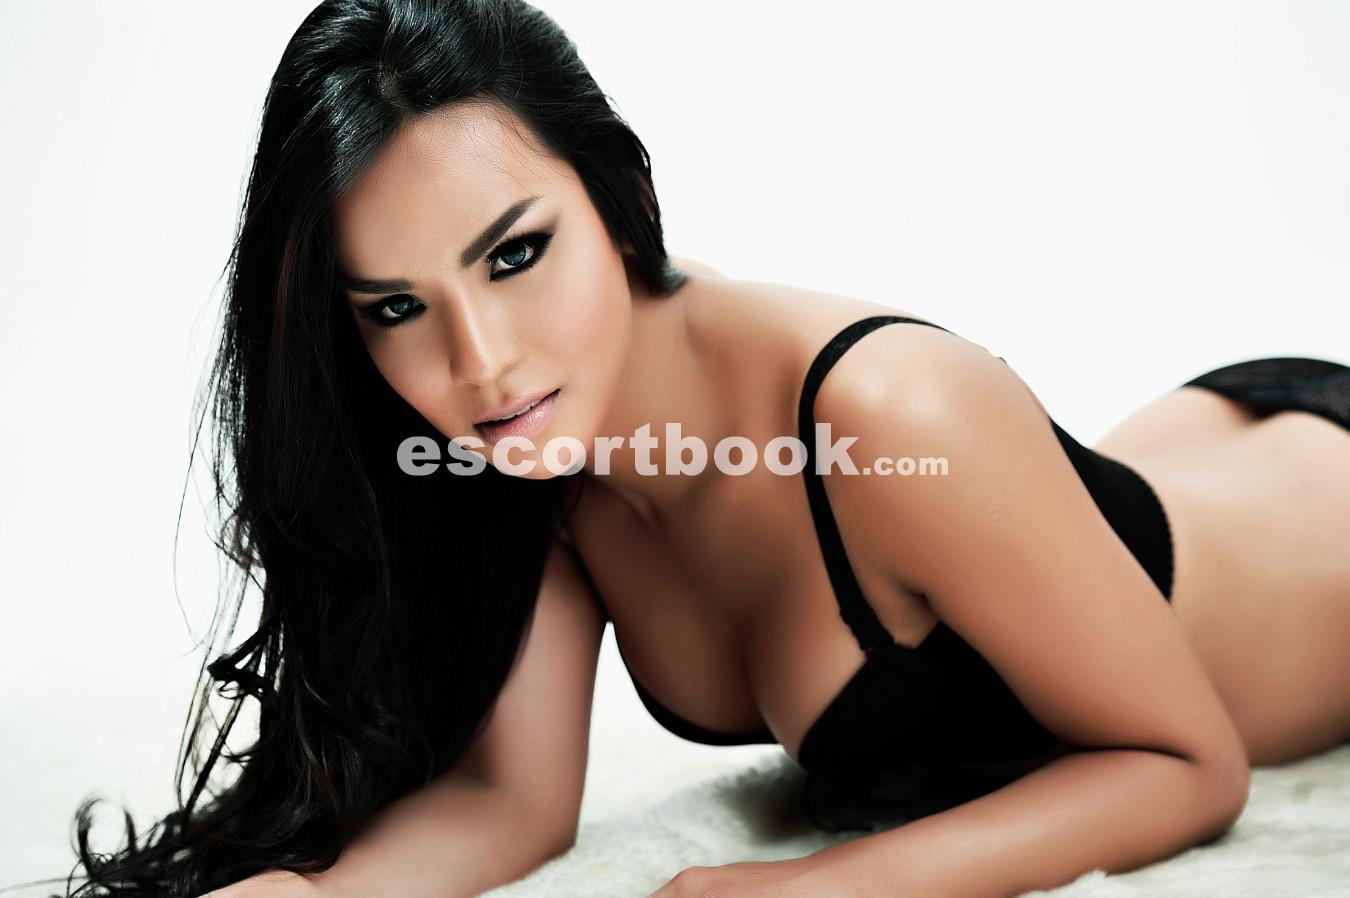 transexual escort escort book Sydney